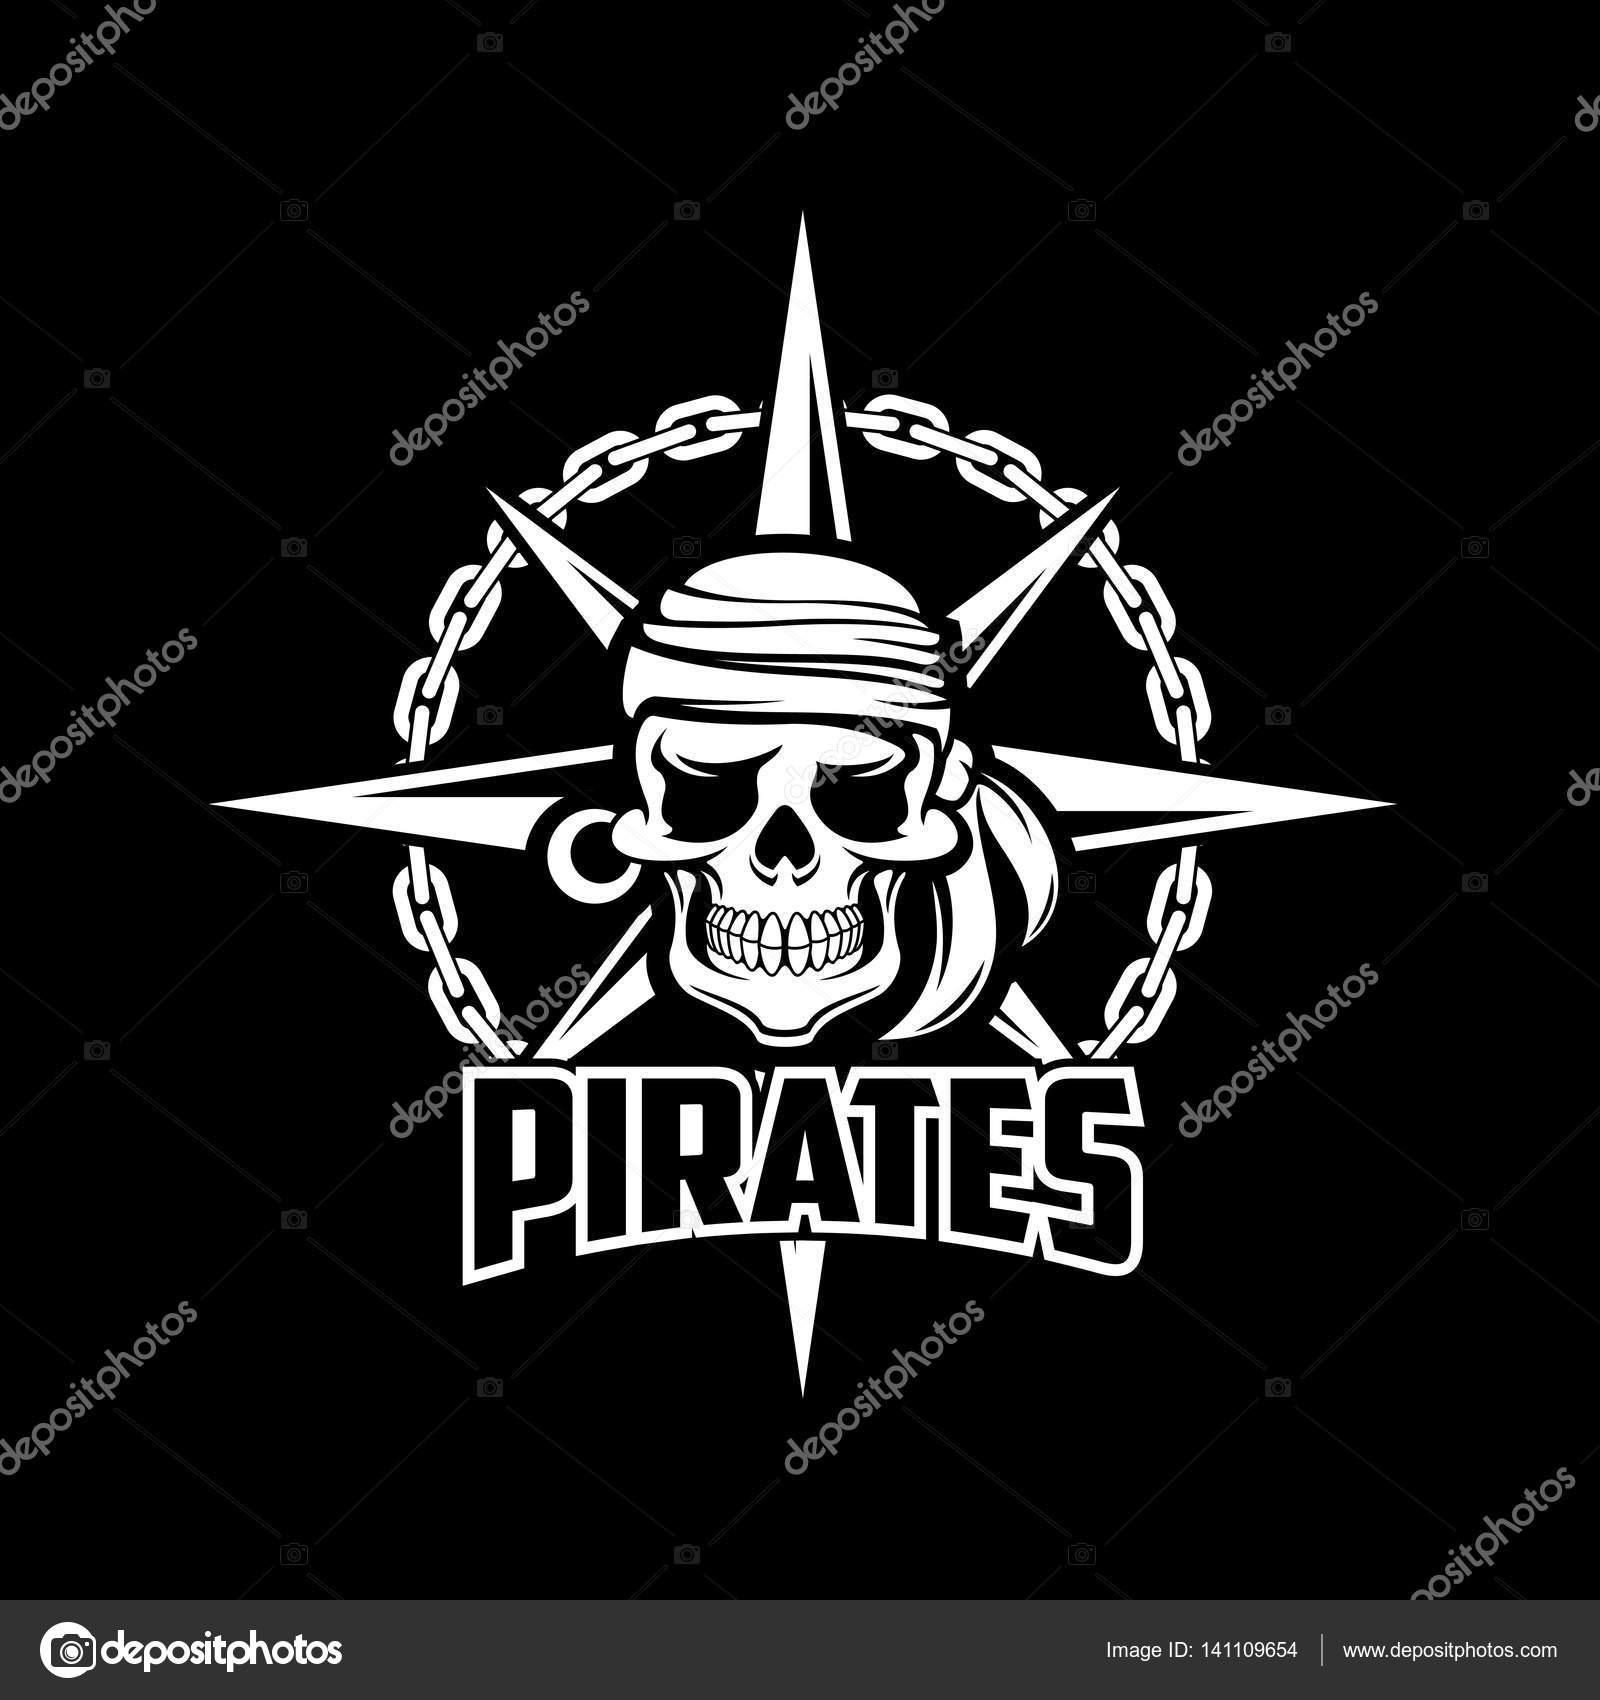 pirates cr ne symbole noir vector drapeau ou une affiche image vectorielle seamartini 141109654. Black Bedroom Furniture Sets. Home Design Ideas